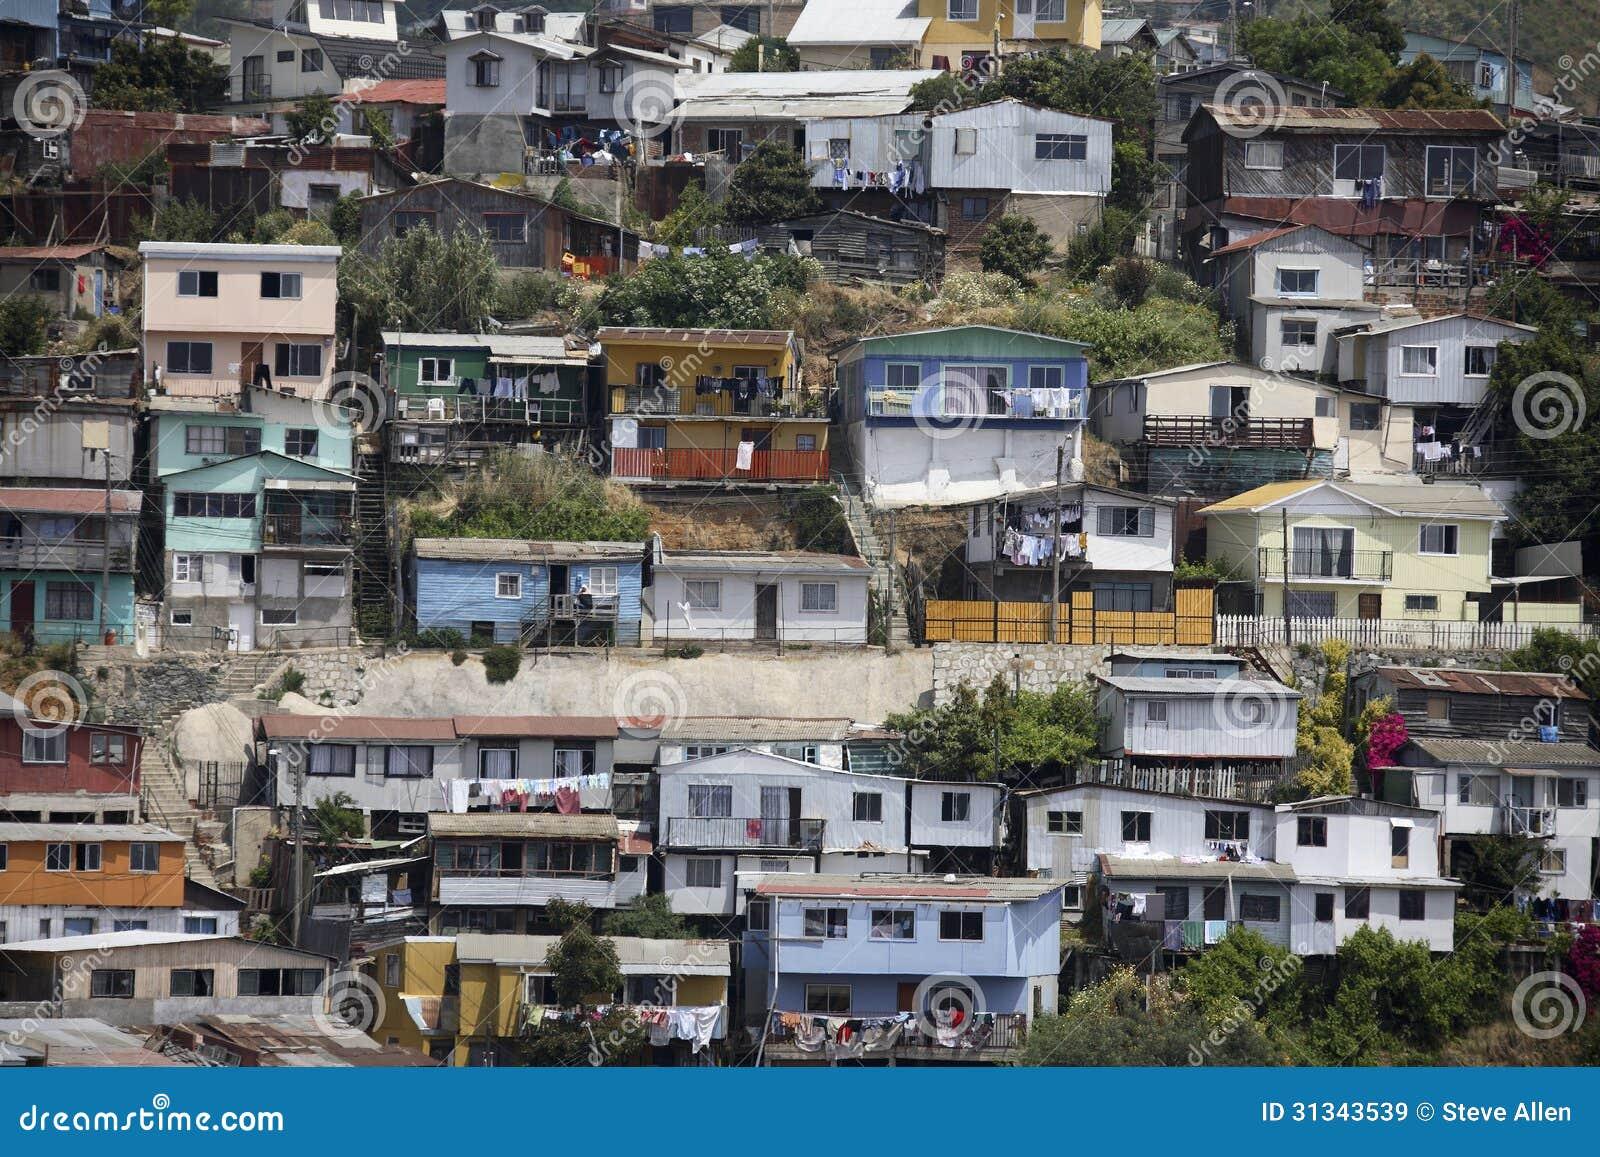 Valparaiso Chile South America Royalty Free Stock